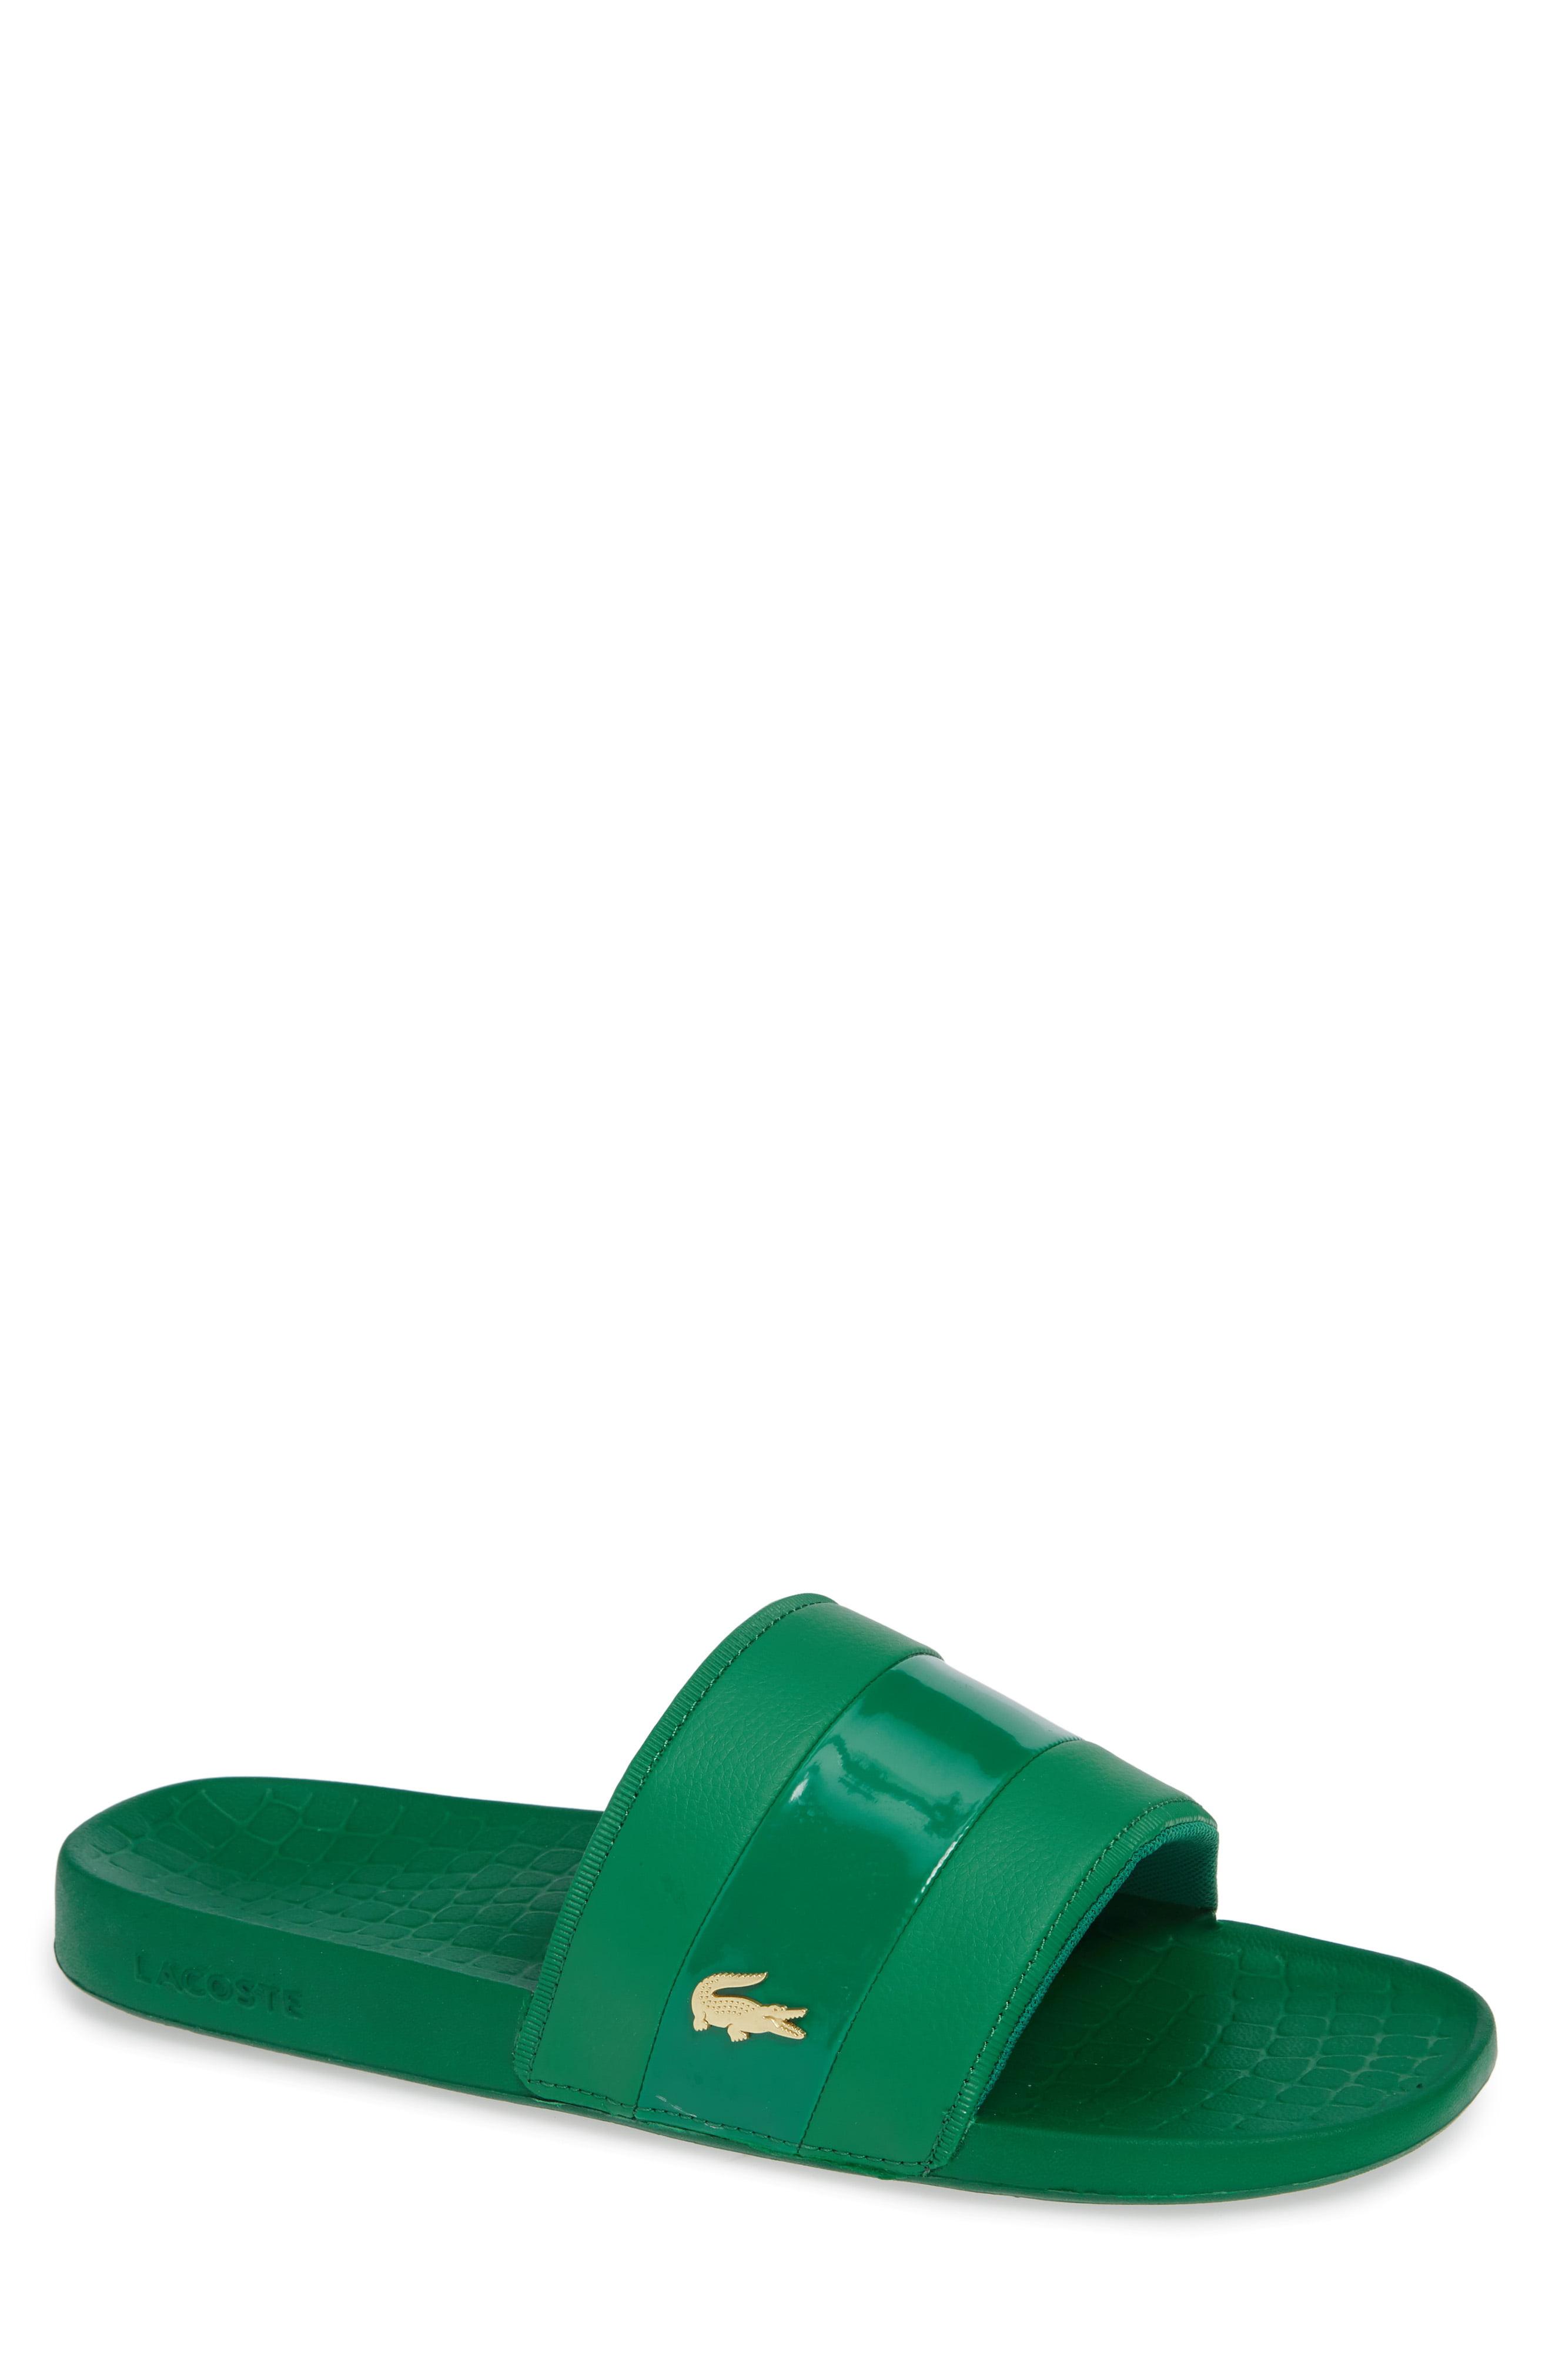 Pin on Slide sandals